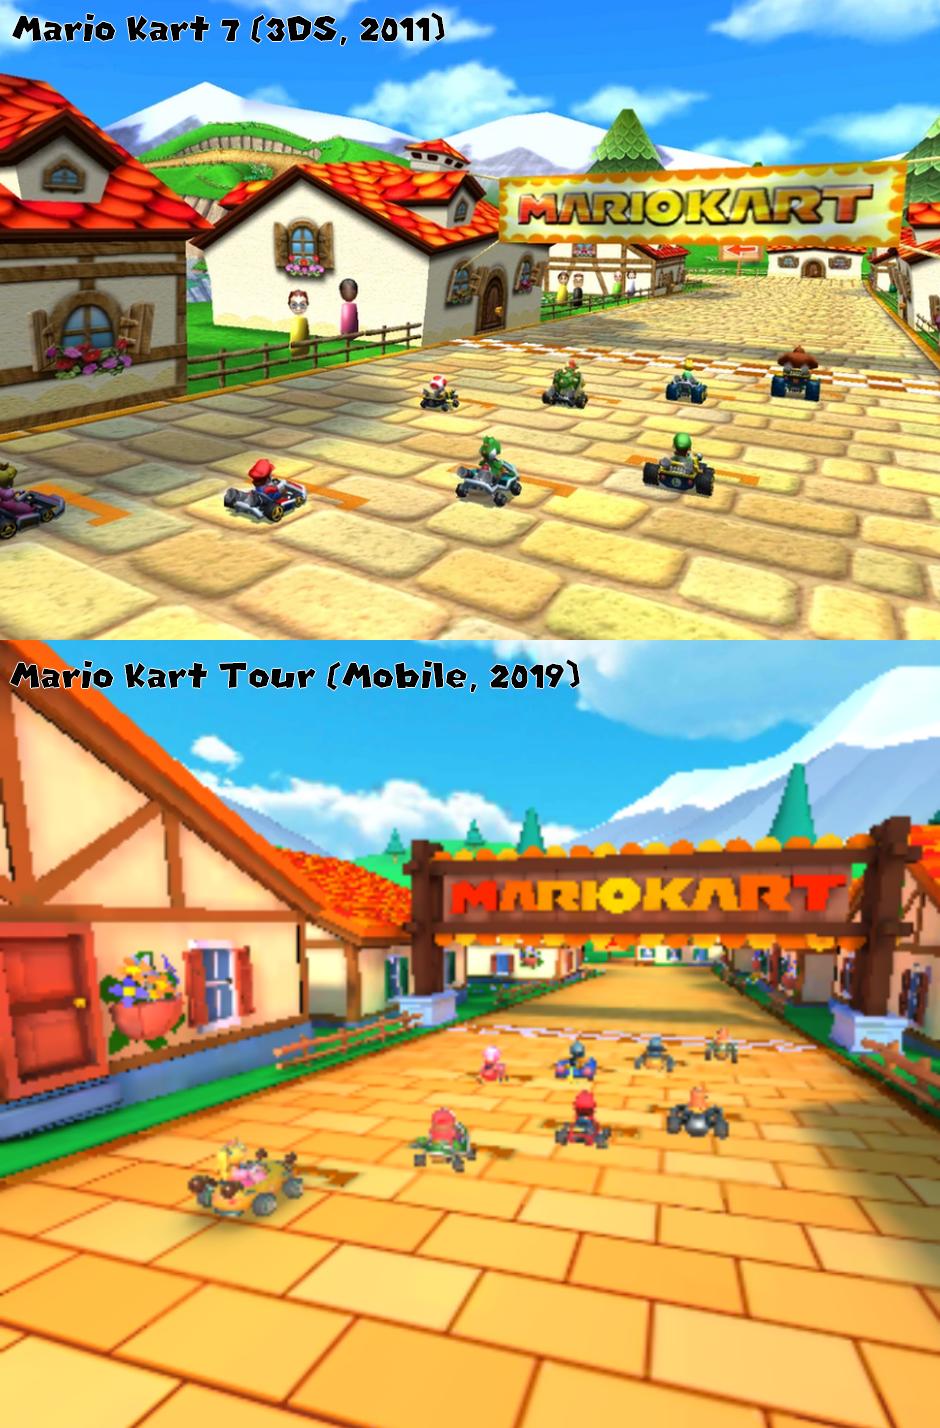 Comparison Between Mario Kart 7 Daisy Hills 1st Pic And Mario Kart Tour Daisy Hills 2nd Pic Which One Do You Prefer Mario Kart 7 Mario Kart Mario